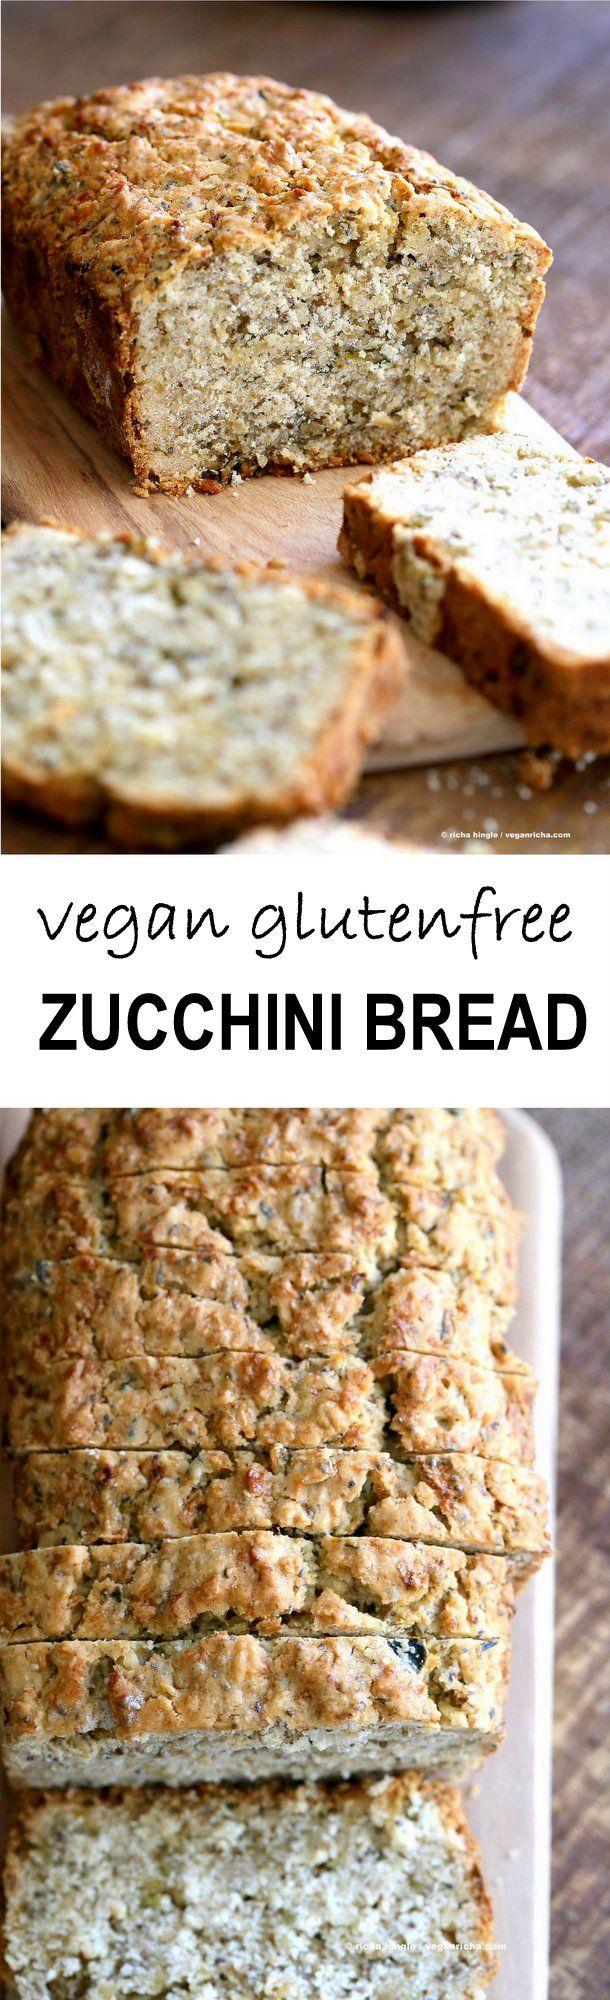 Vegan Gluten Free Zucchini Bread Recipe With Images Gluten